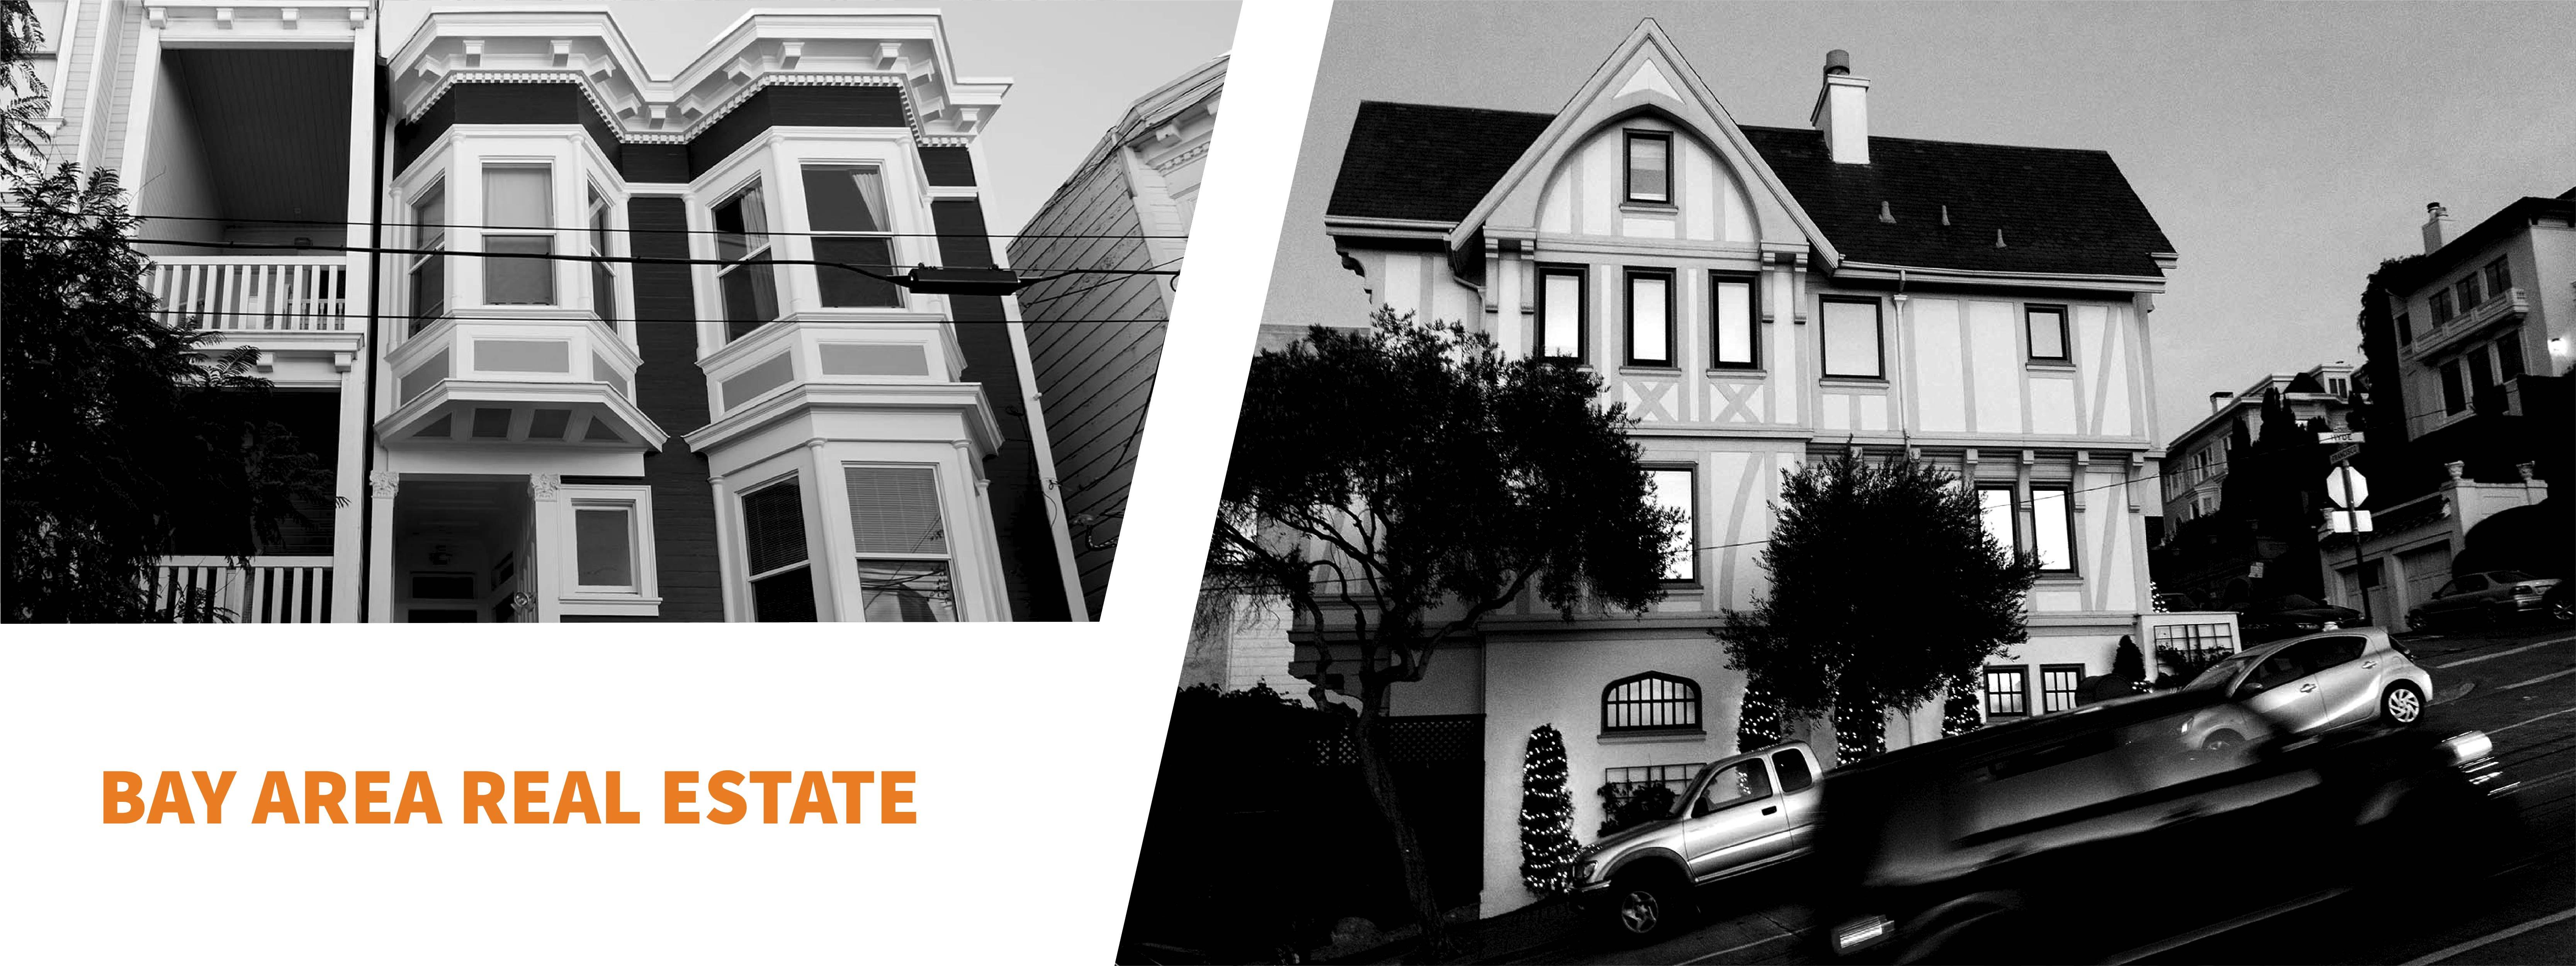 Bay Area Real Estate: Portola, A Hidden Gem of San Francisco